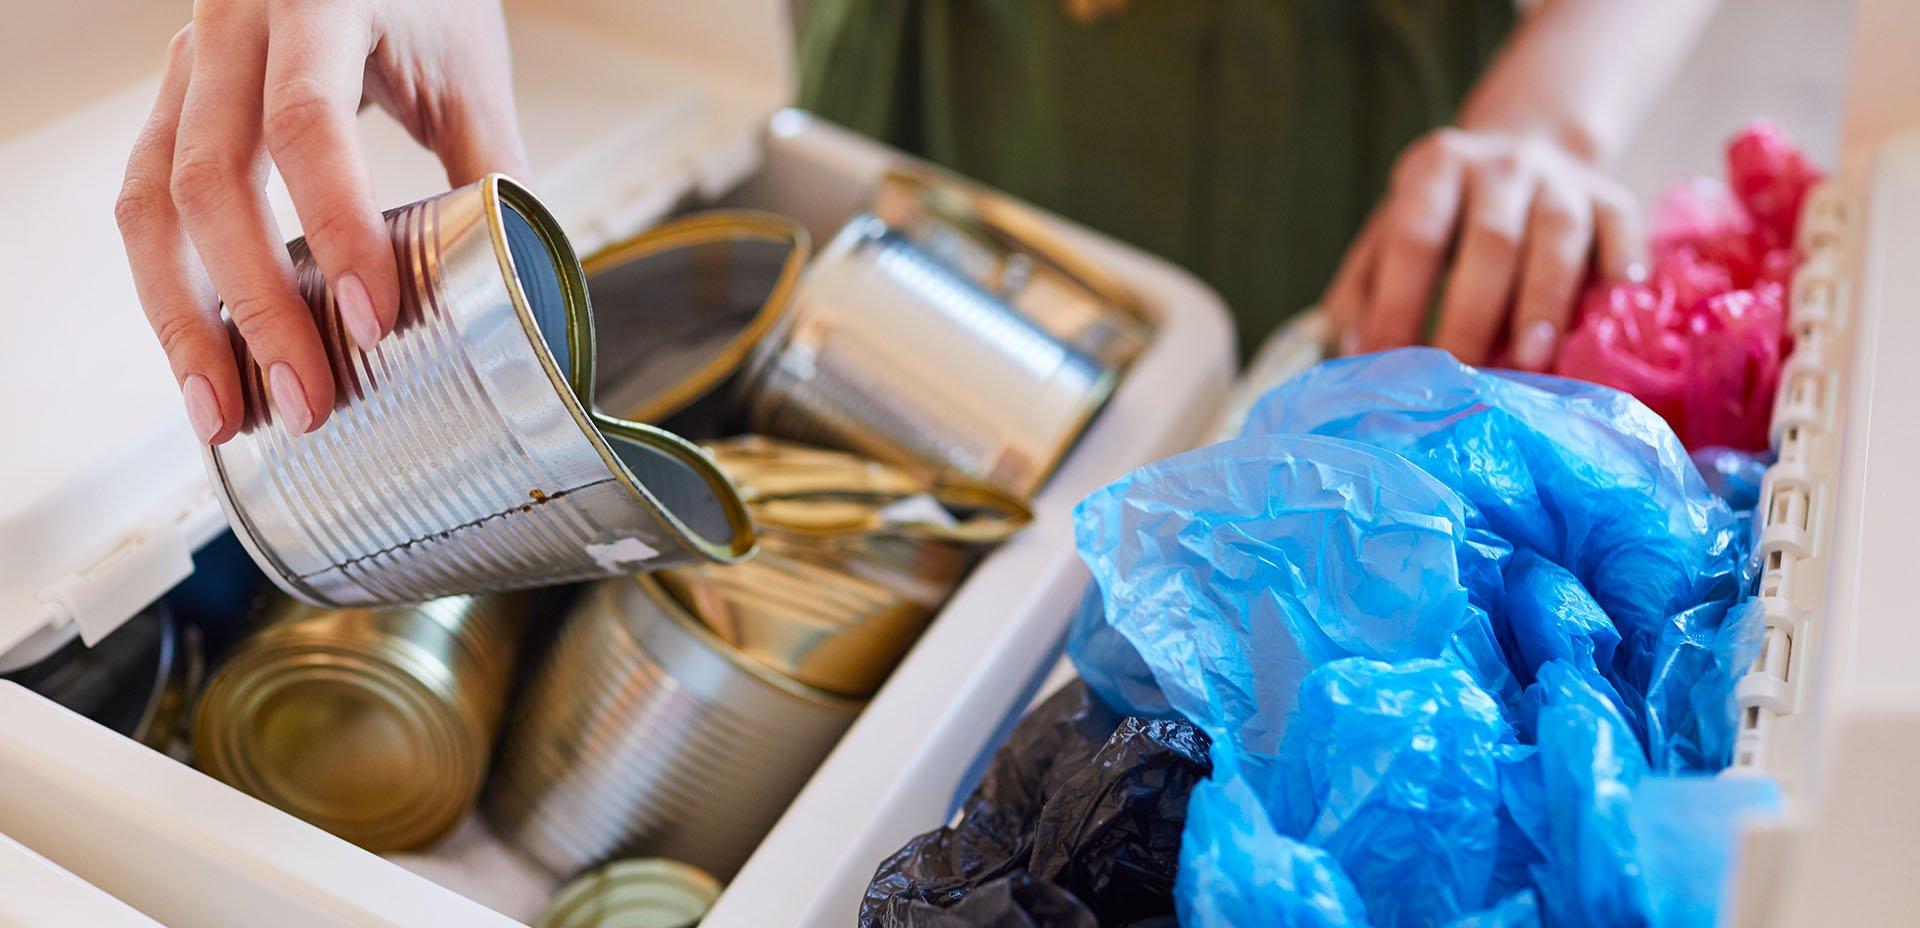 raccolta differenziata di rifiuti